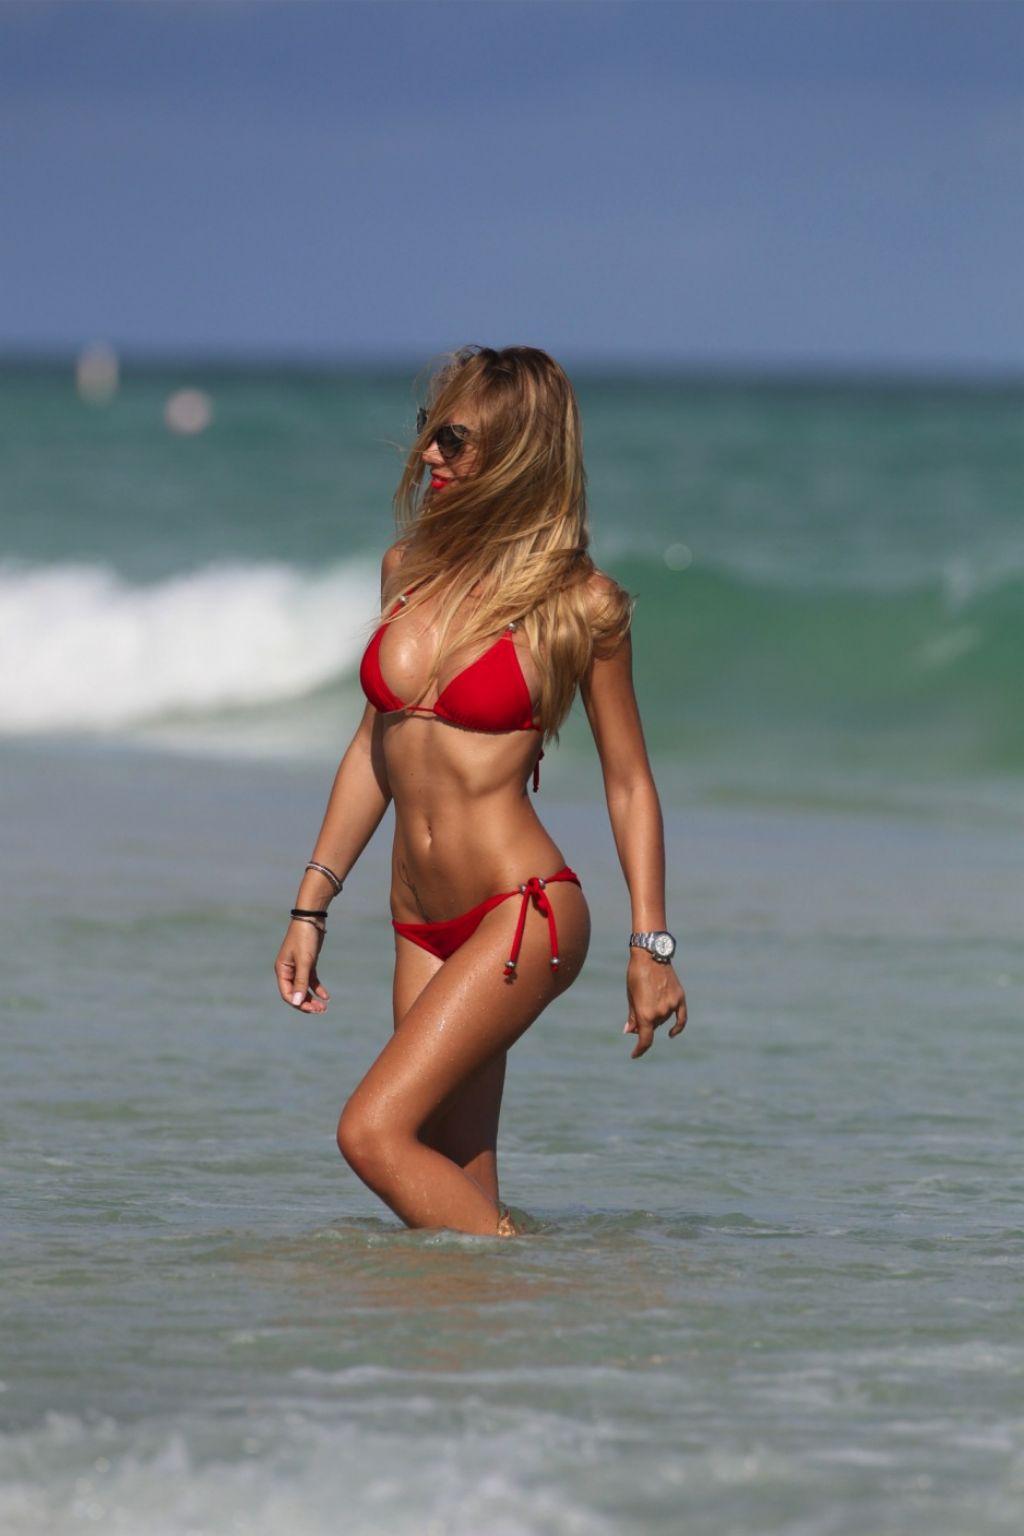 Laura Cremaschi In A Red Triangle Top Miami Beach November 2017